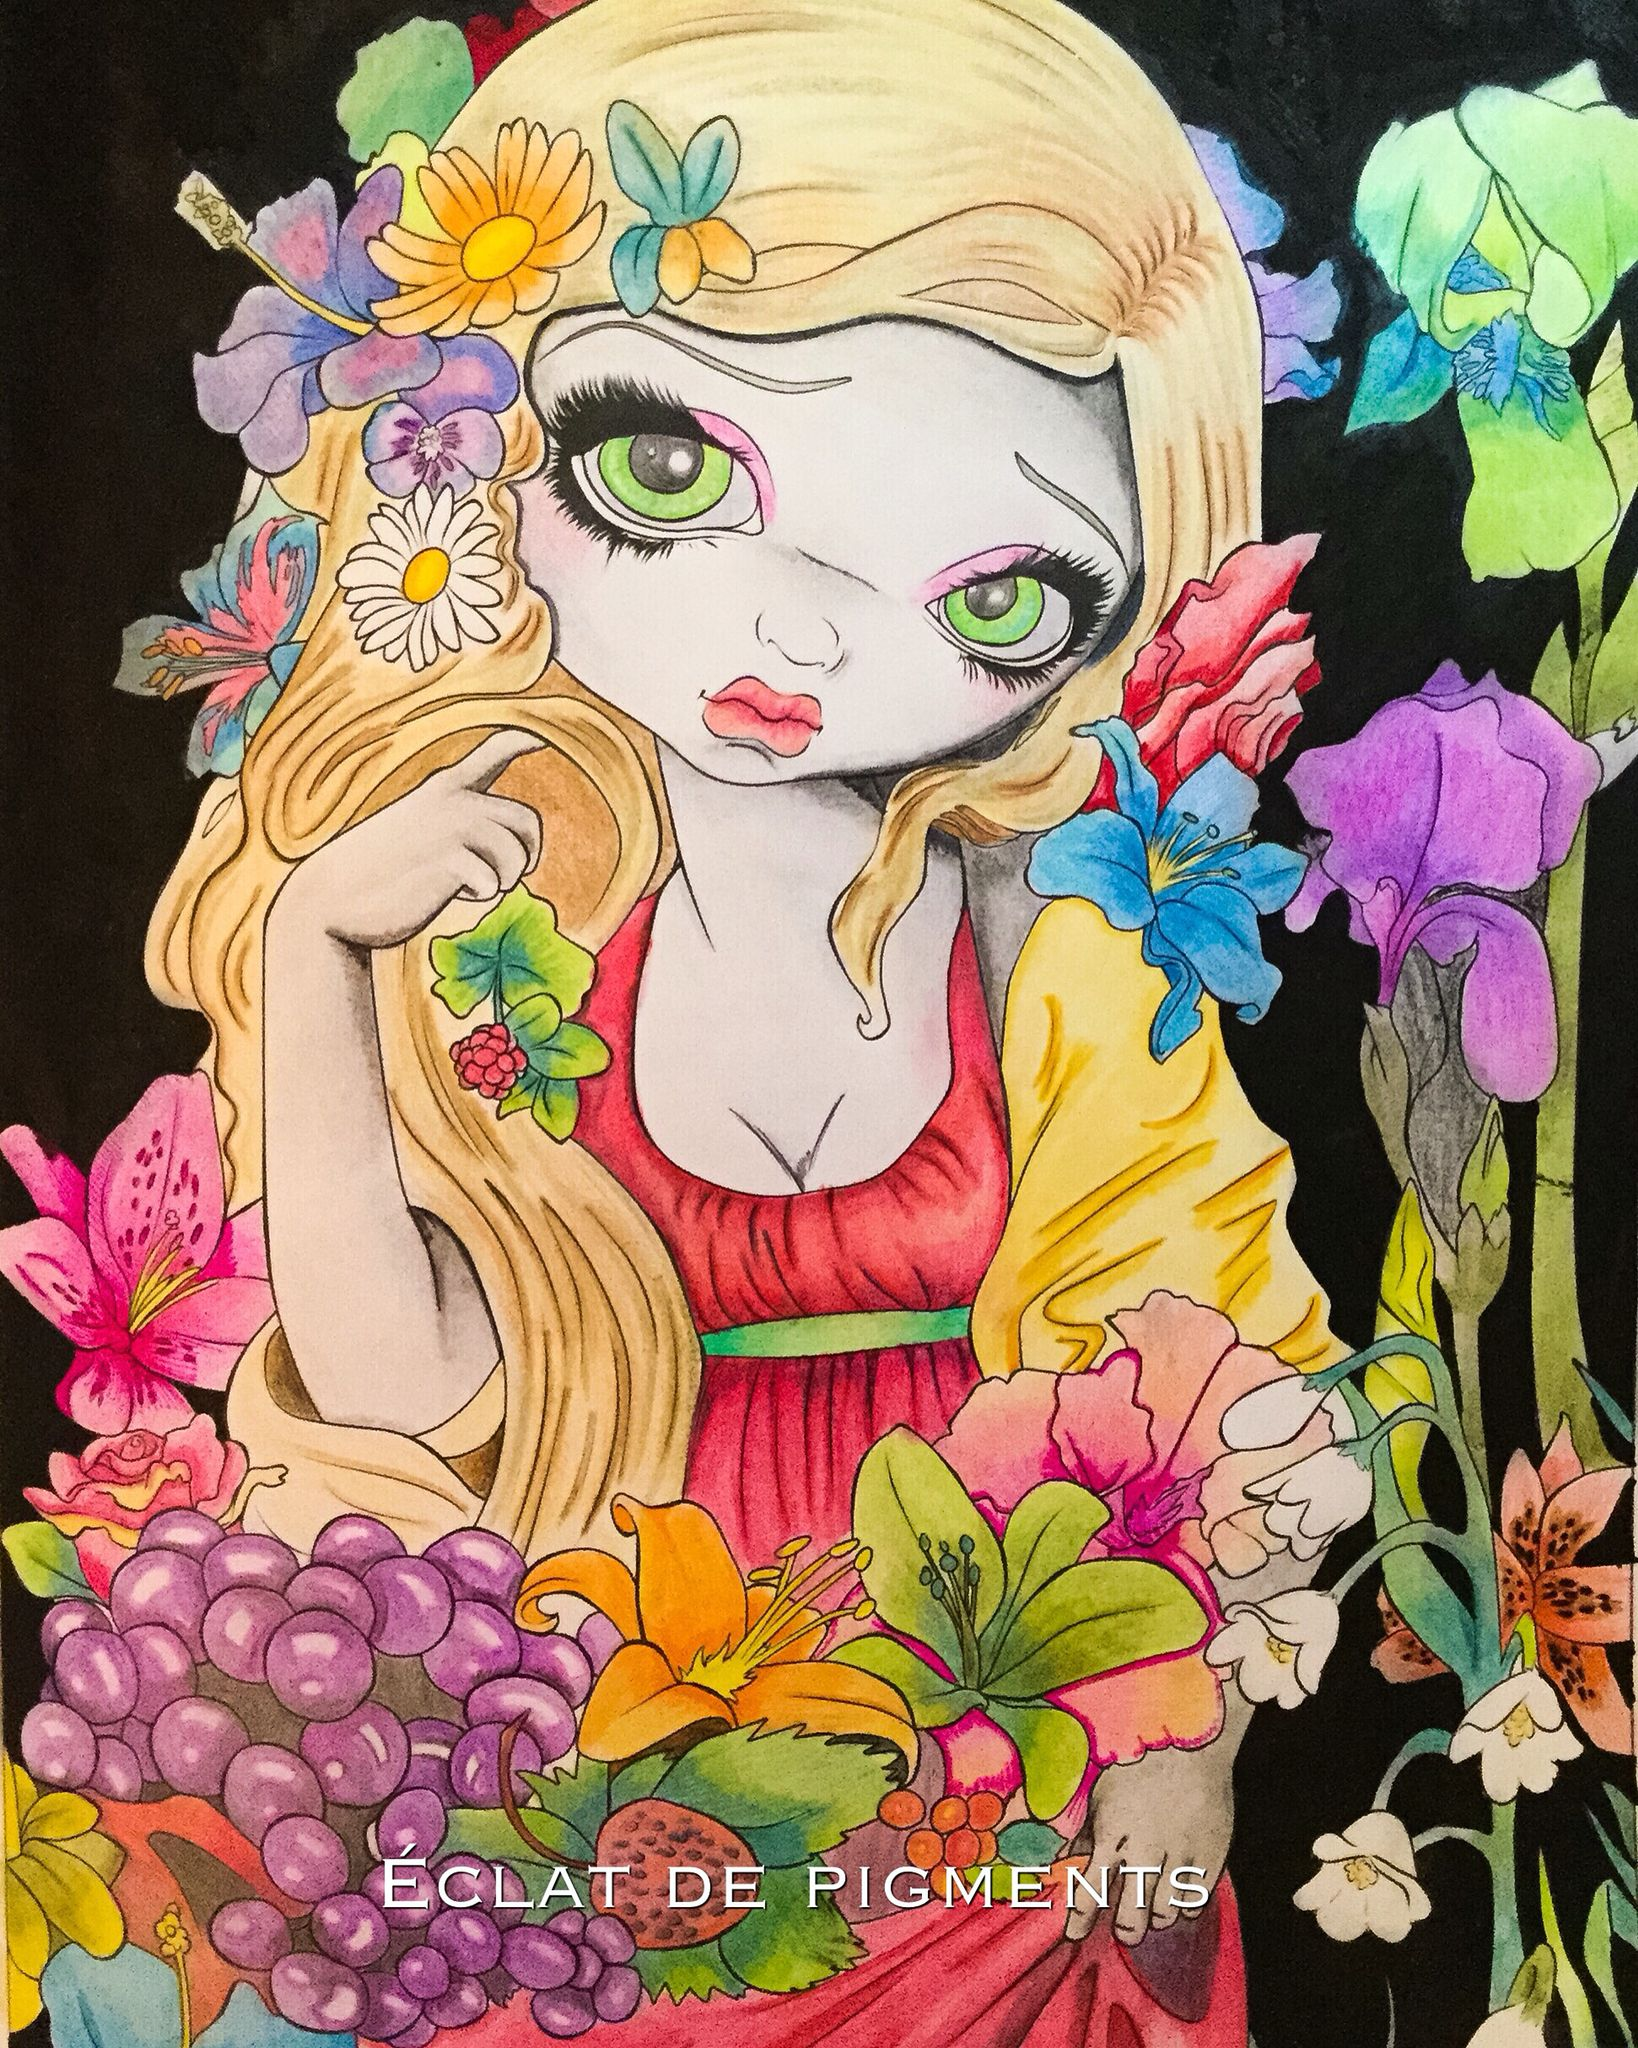 Pin de Claudia M. en Coloring Books   Pinterest